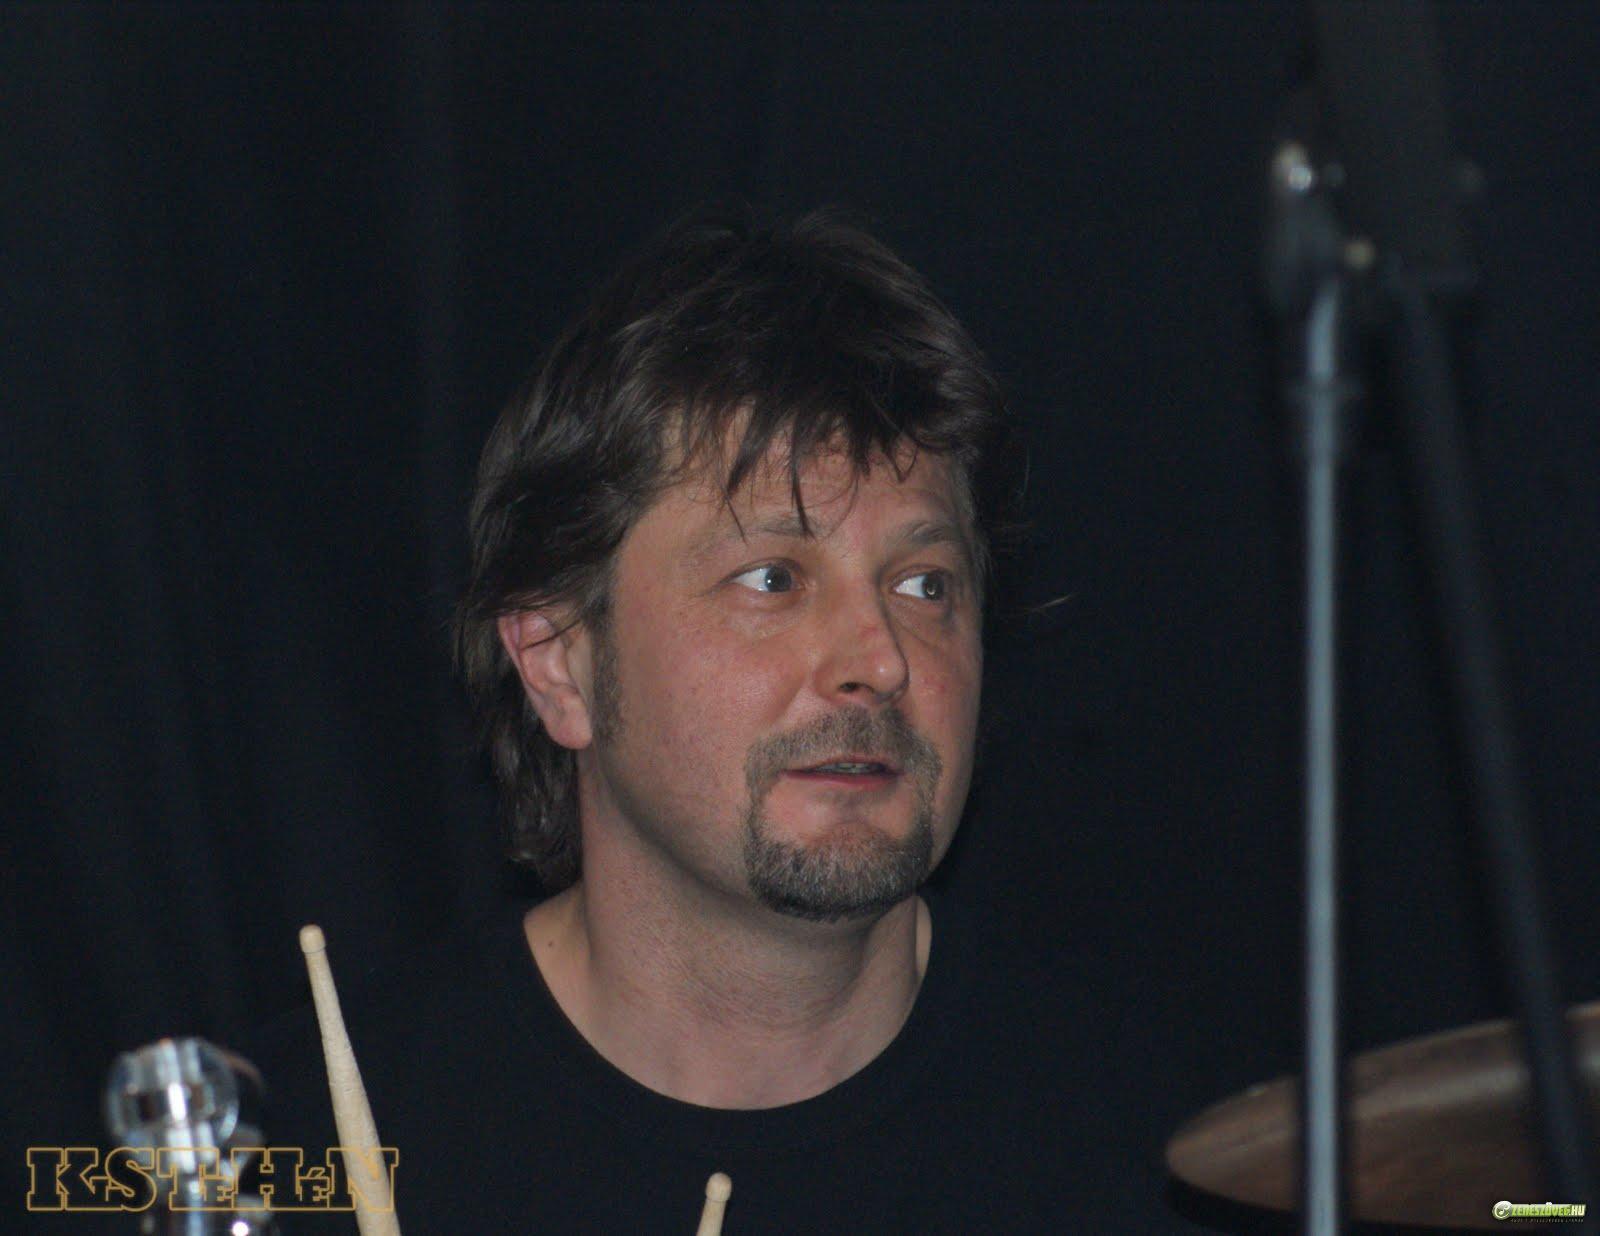 Schvéger Zoltán